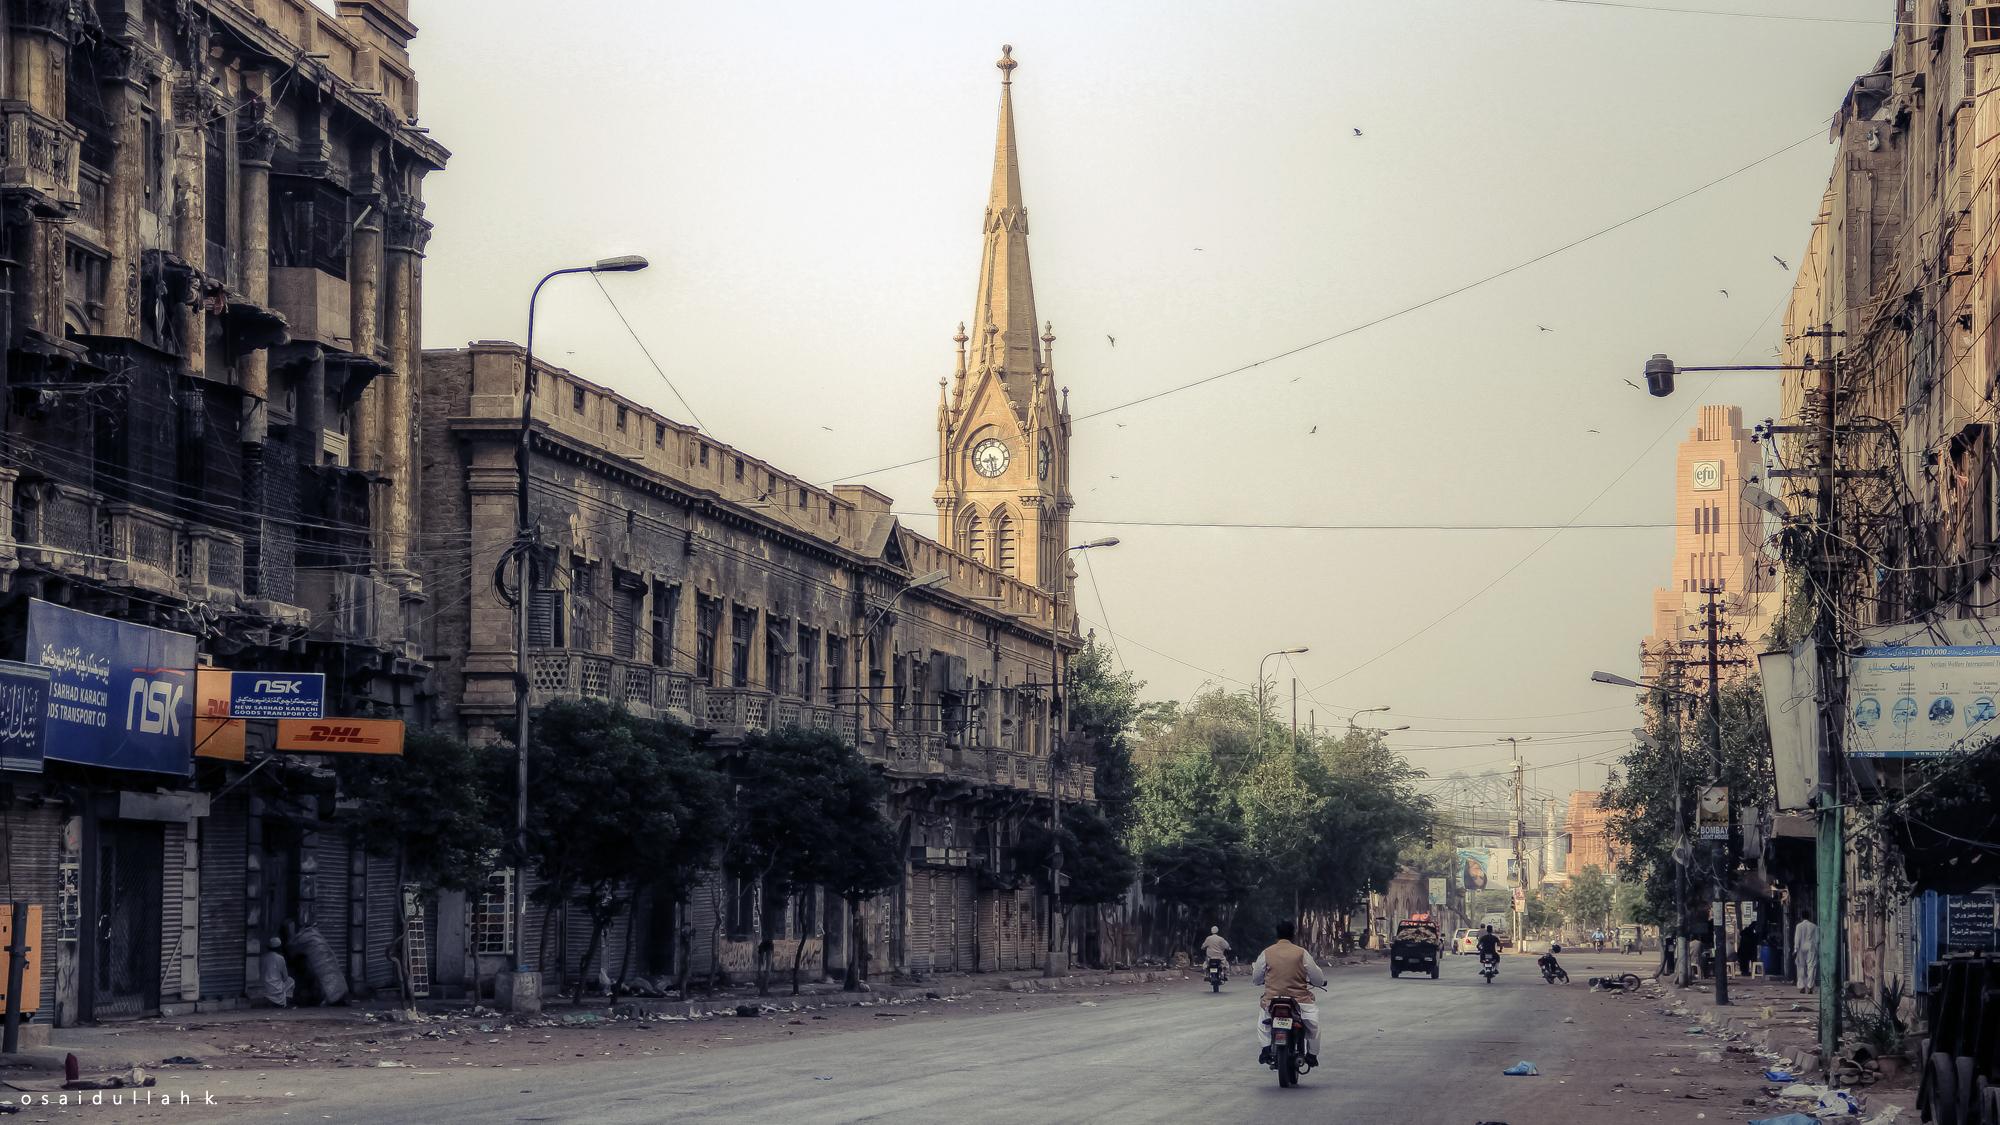 Dystopian Streets of Colonial Karachi [2000x1125] : CityPorn